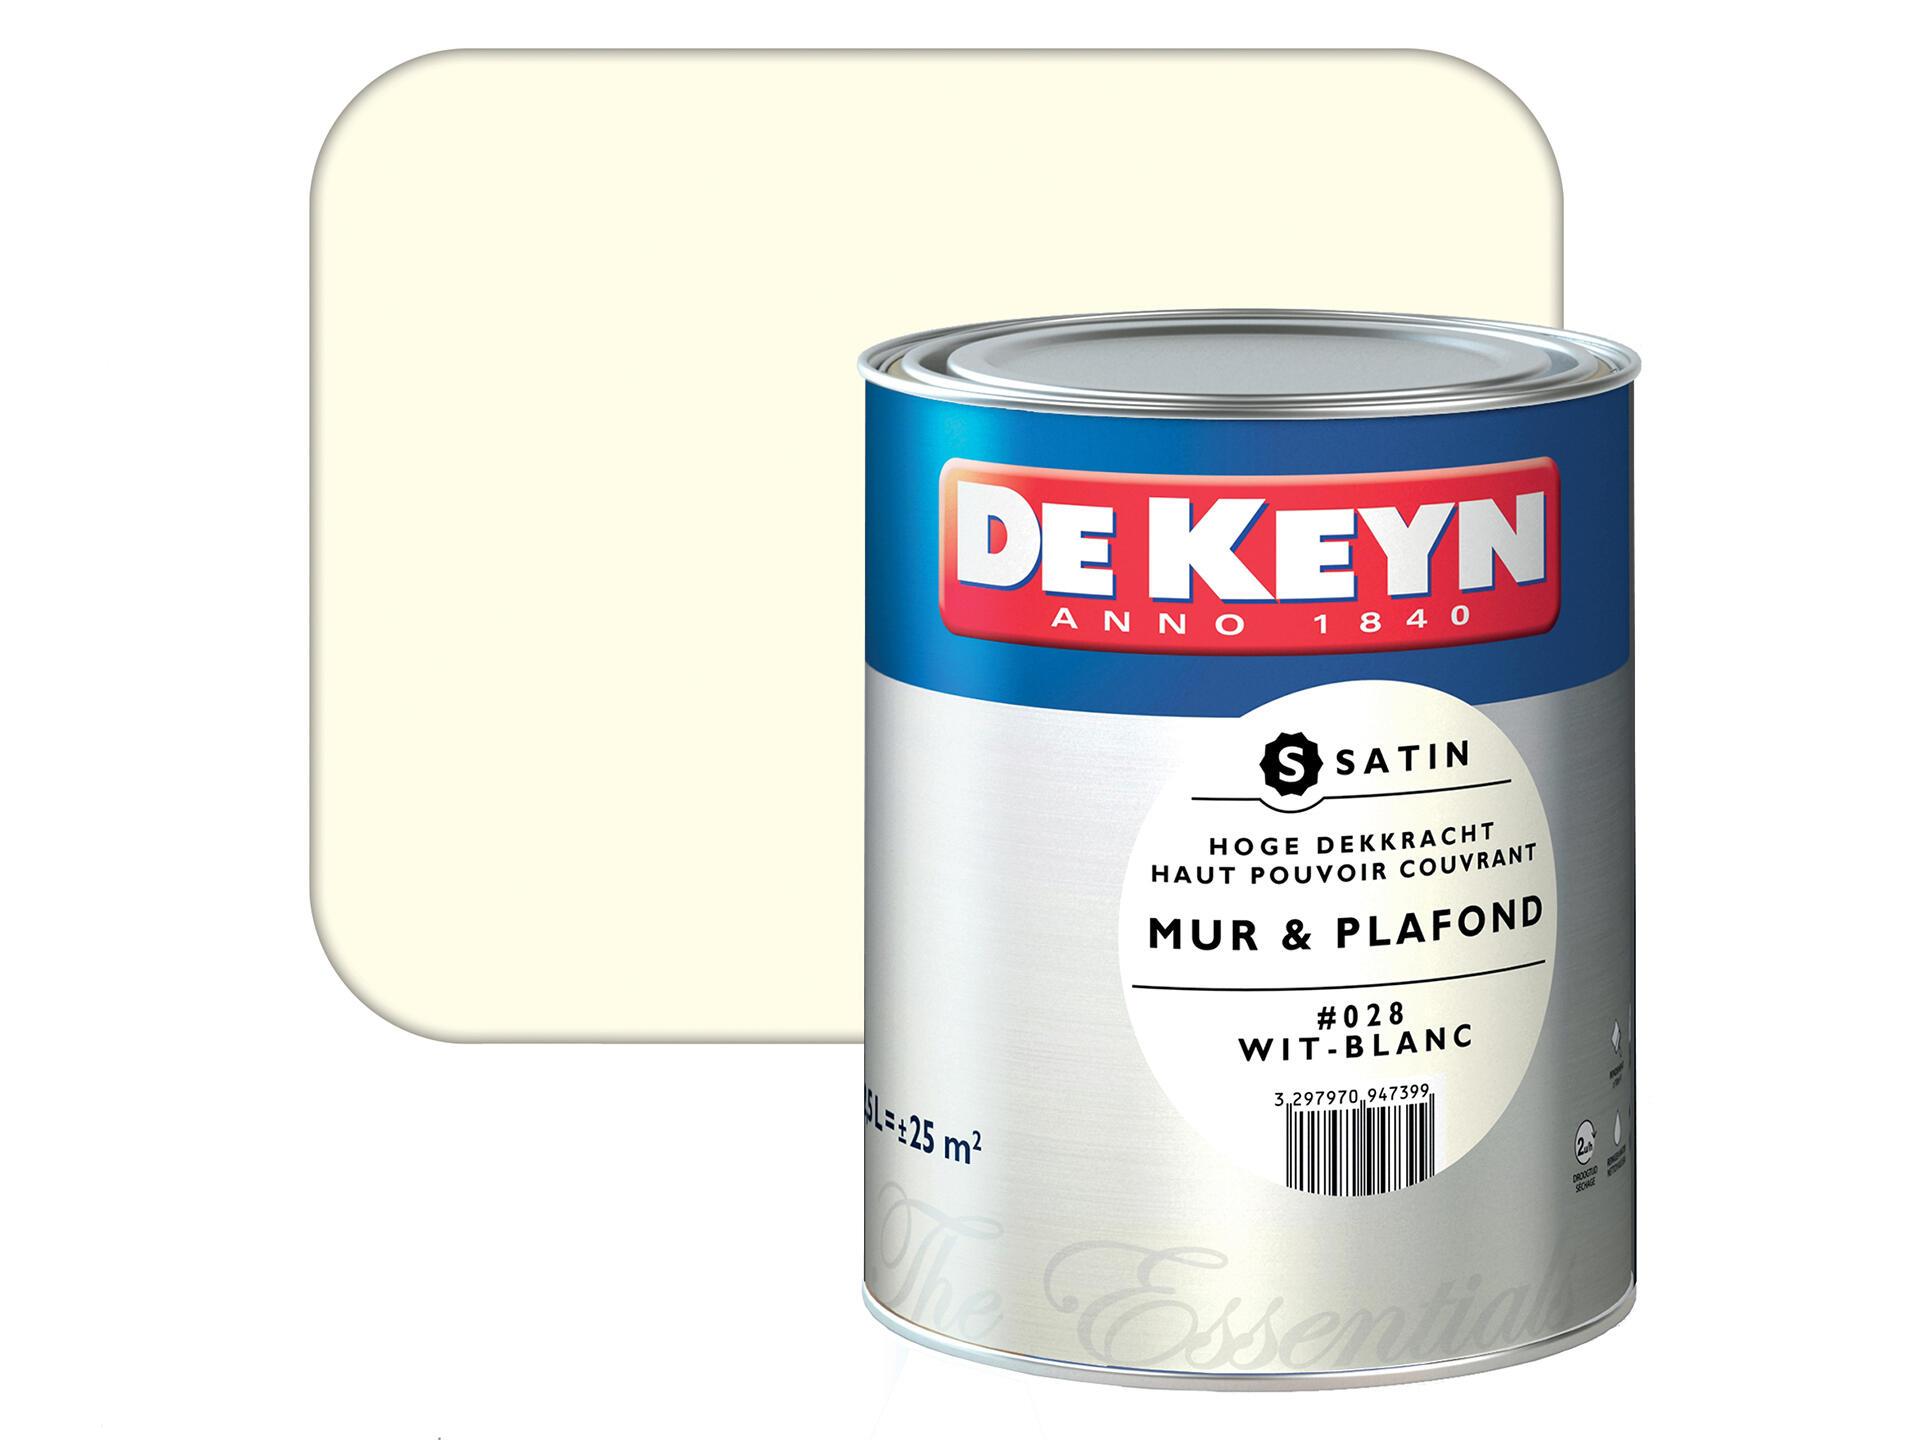 Peinture Blanc Brillant Mur Et Plafond de keyn peinture mur & plafond satin 2,5l blanc #028